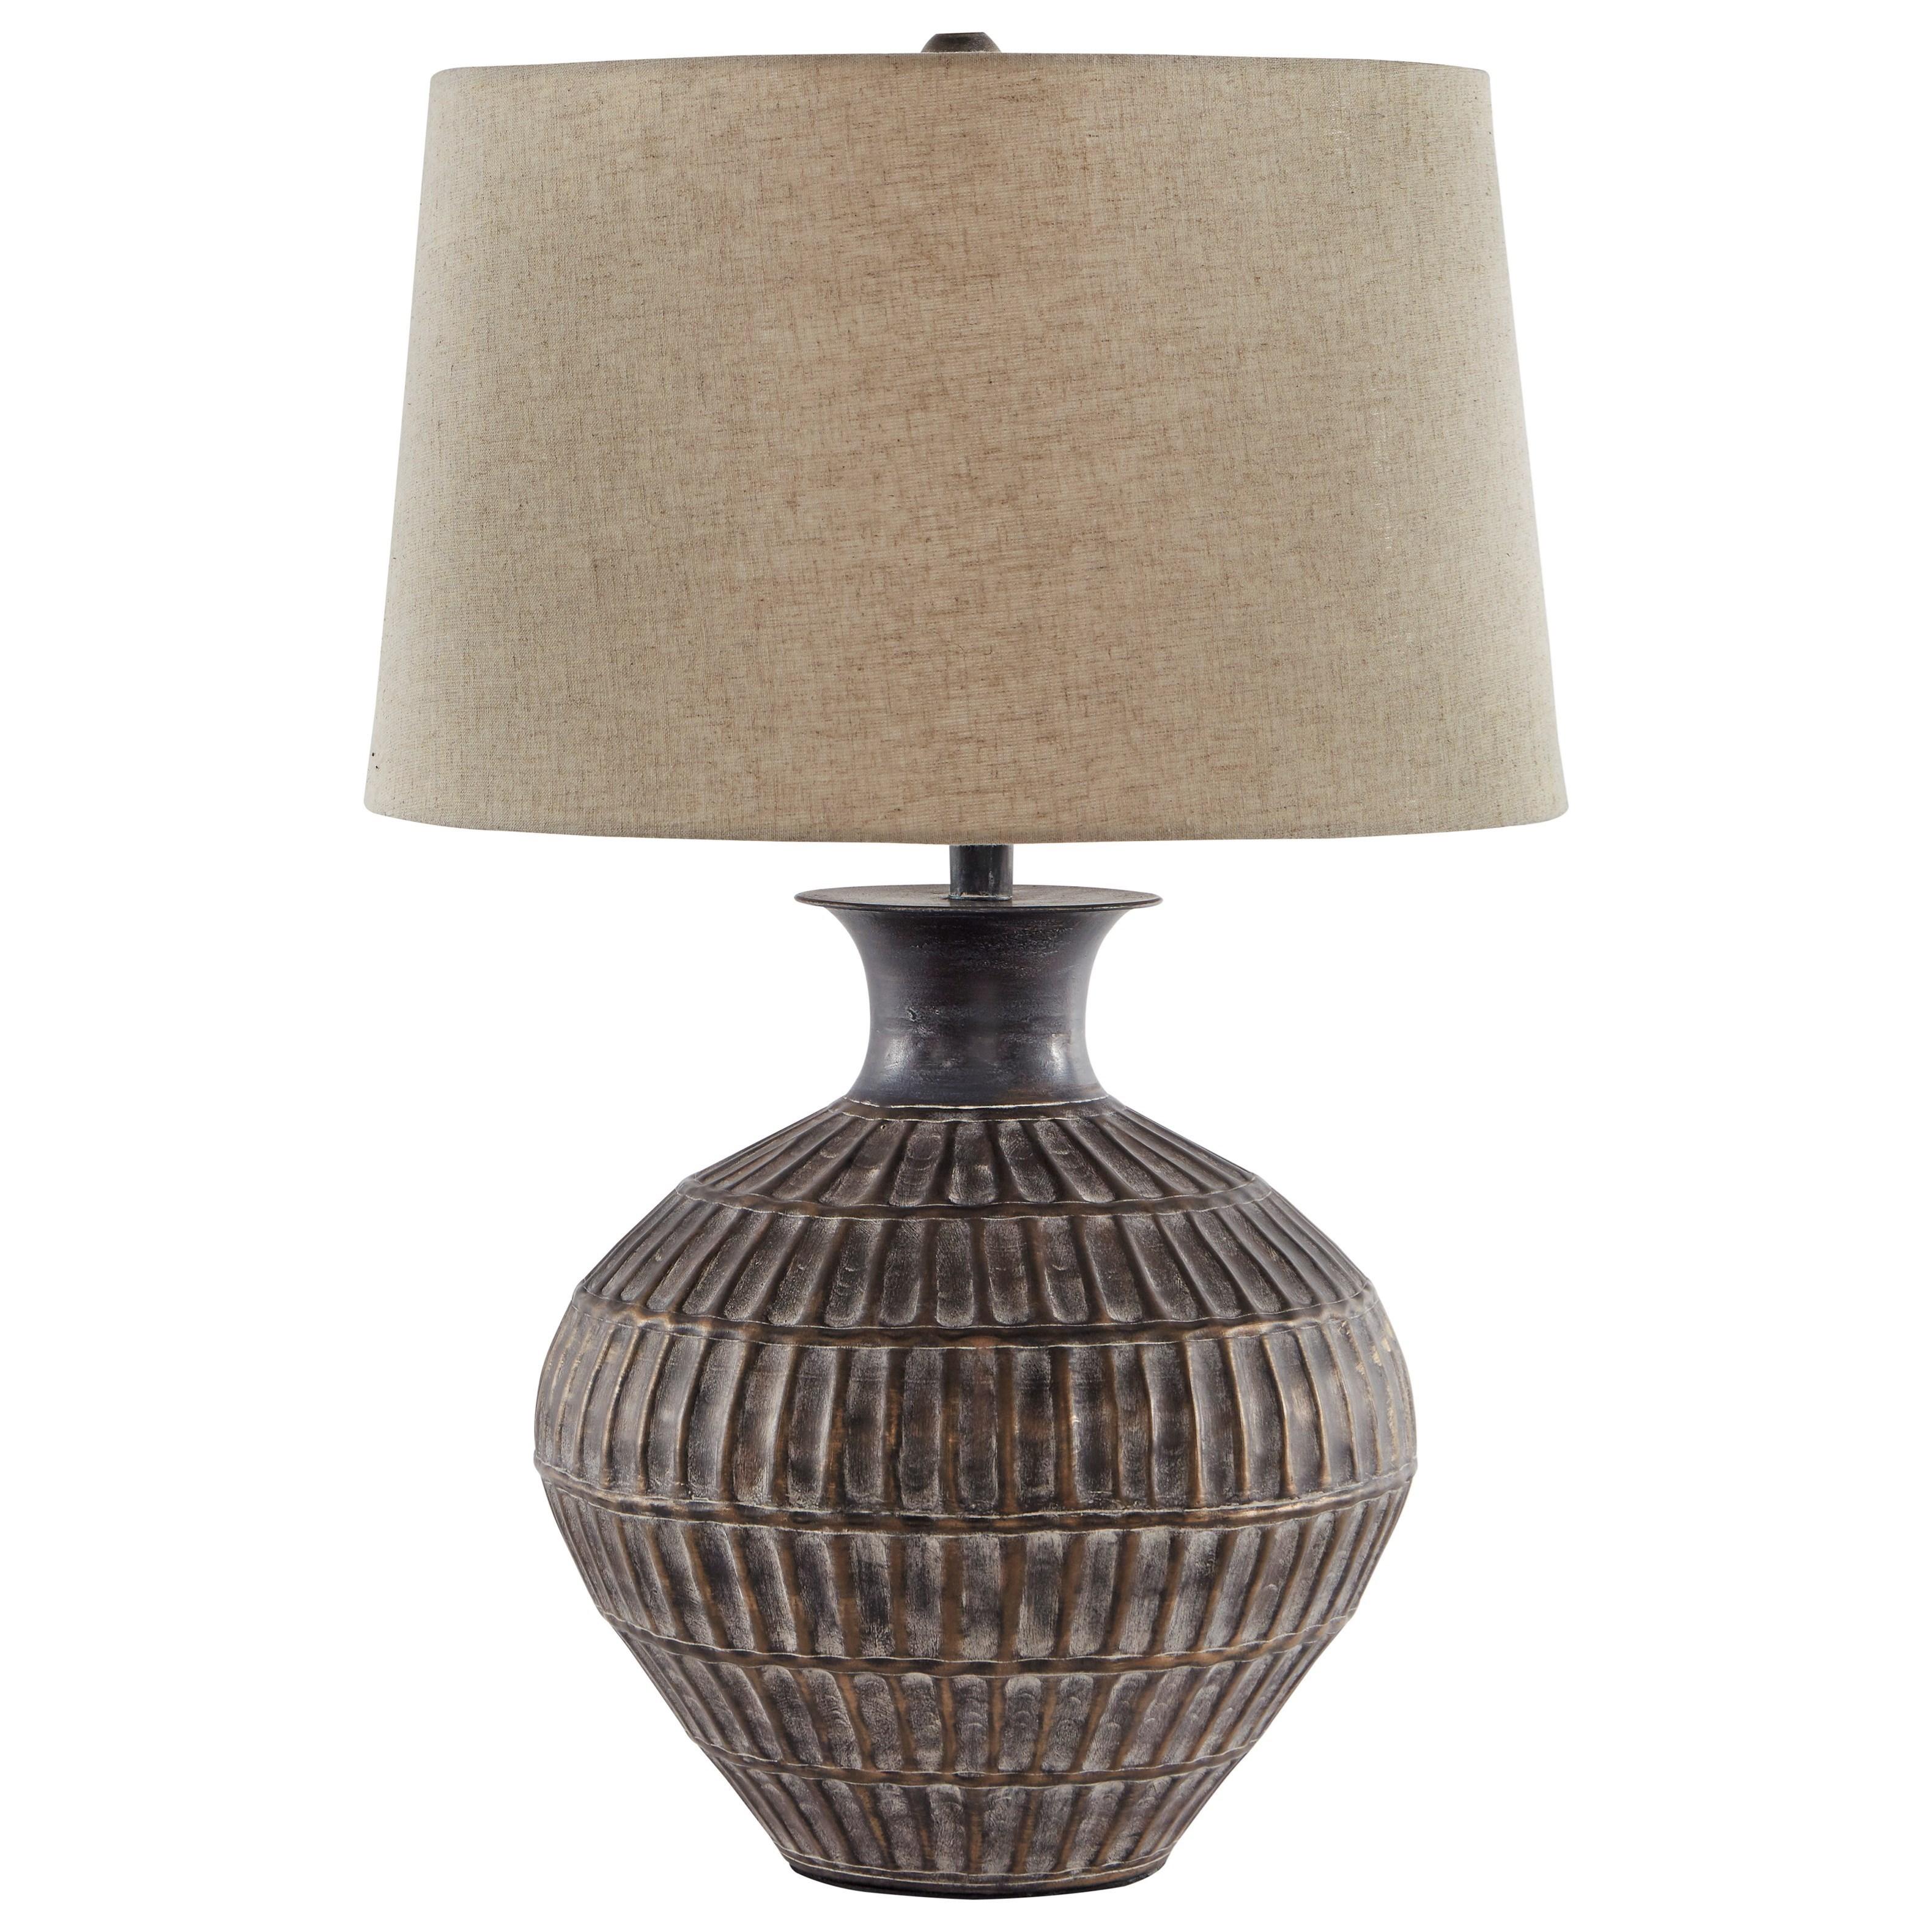 Magan Antique Bronze Finish Metal Table Lamp